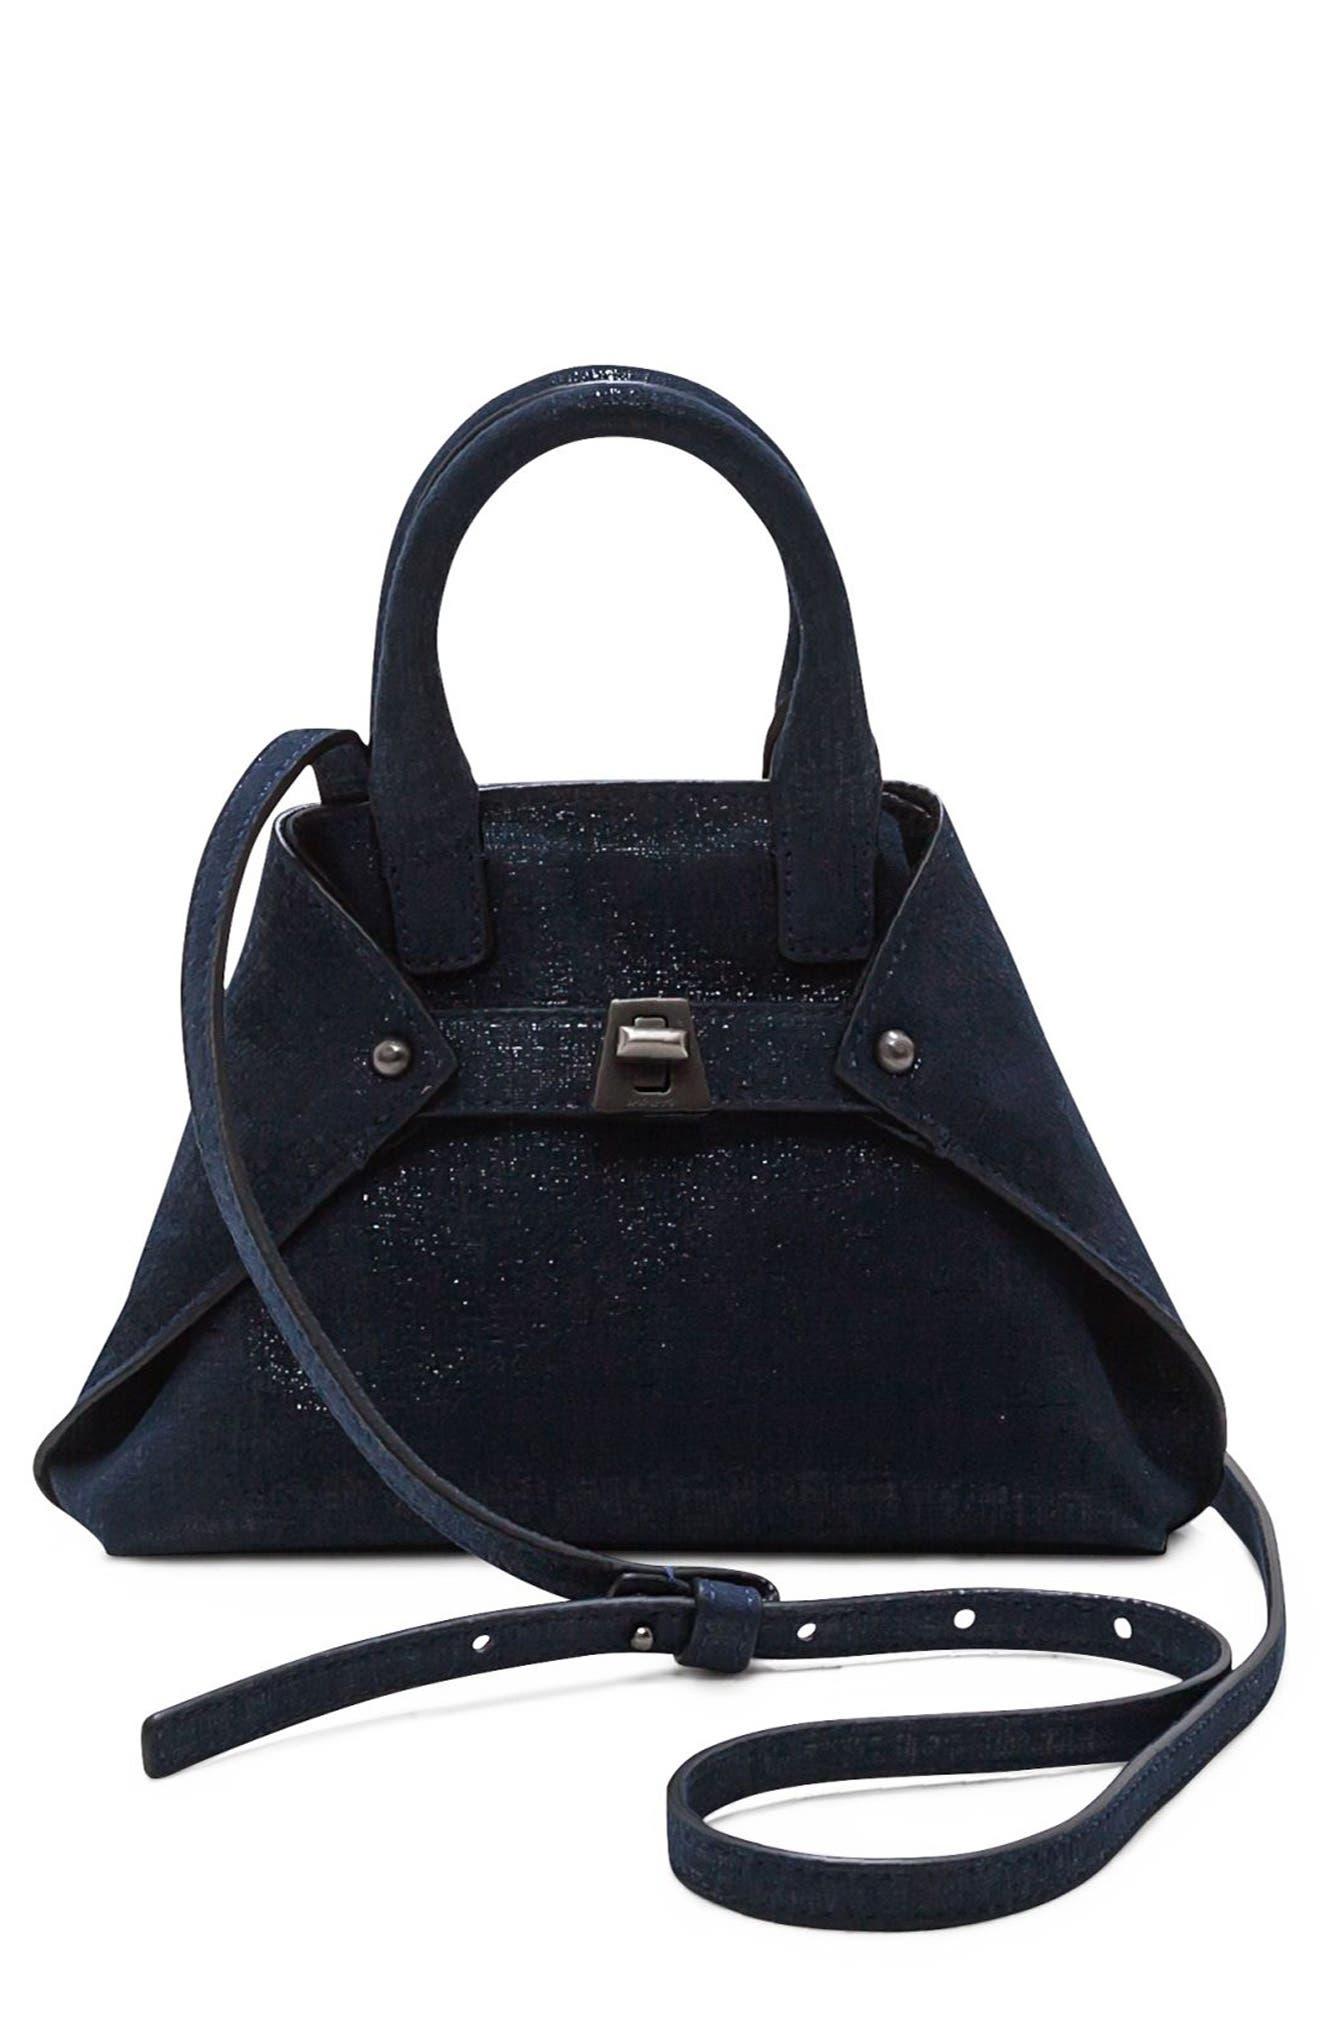 Alternate Image 1 Selected - Akris Tasche Micro Leather Crossbody Bag